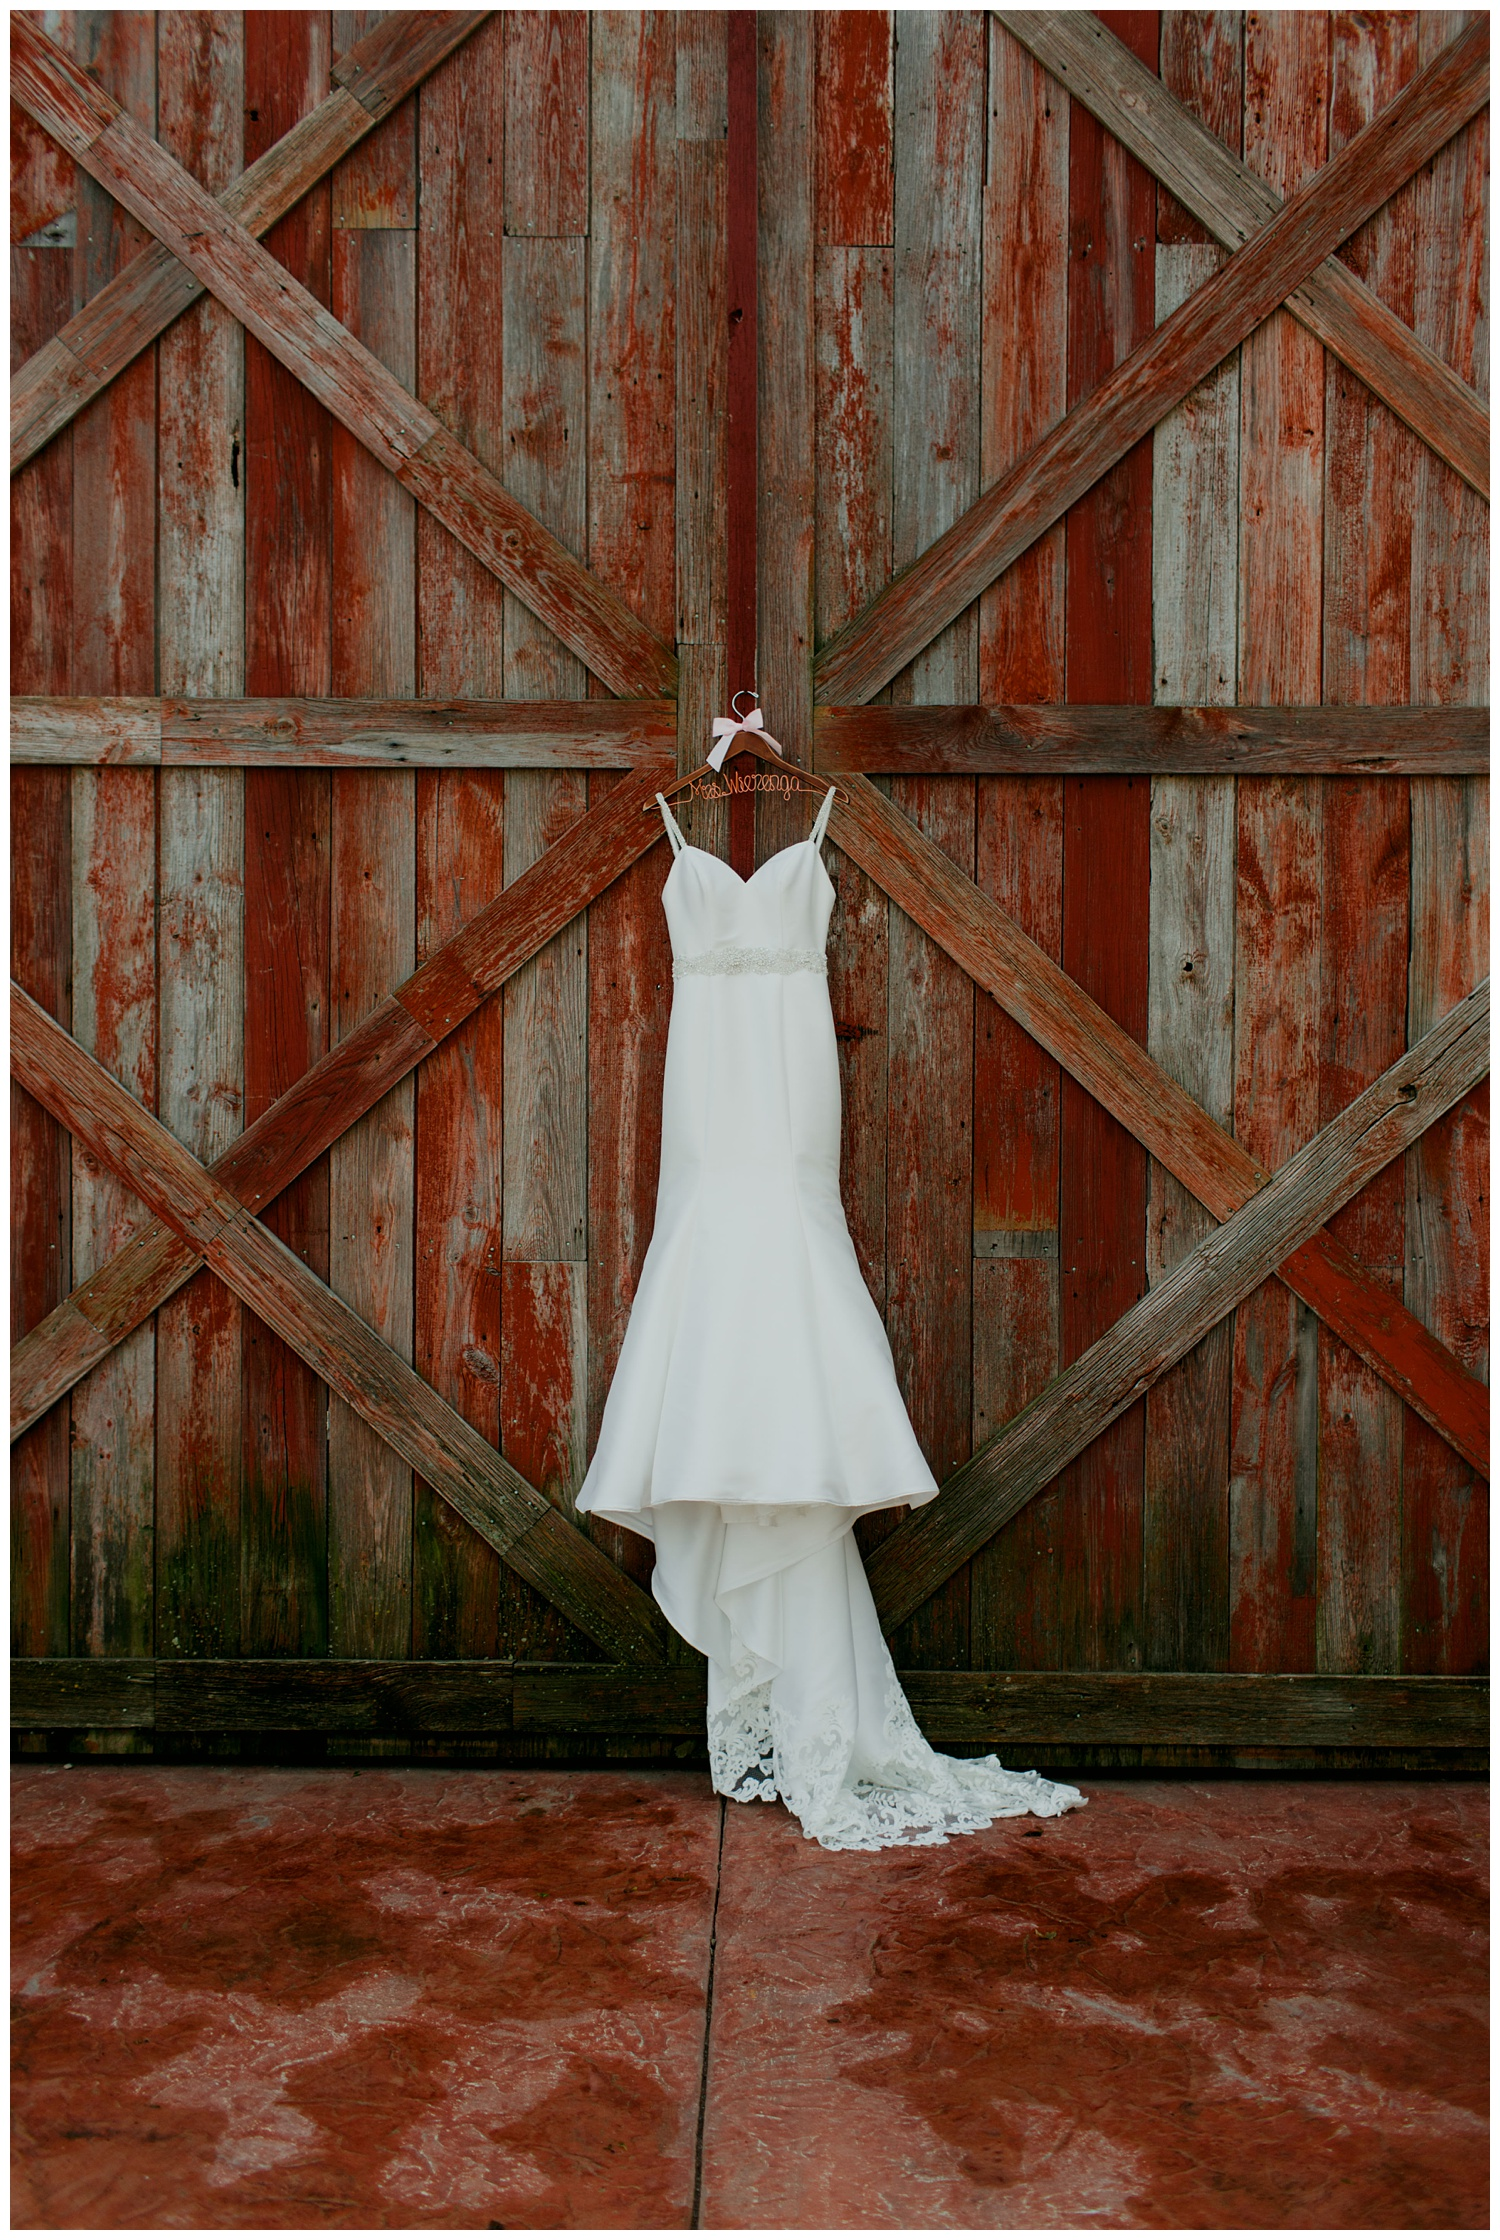 blissfulbarn threeoaks michigan wedding photography journeymandistillery22.jpg